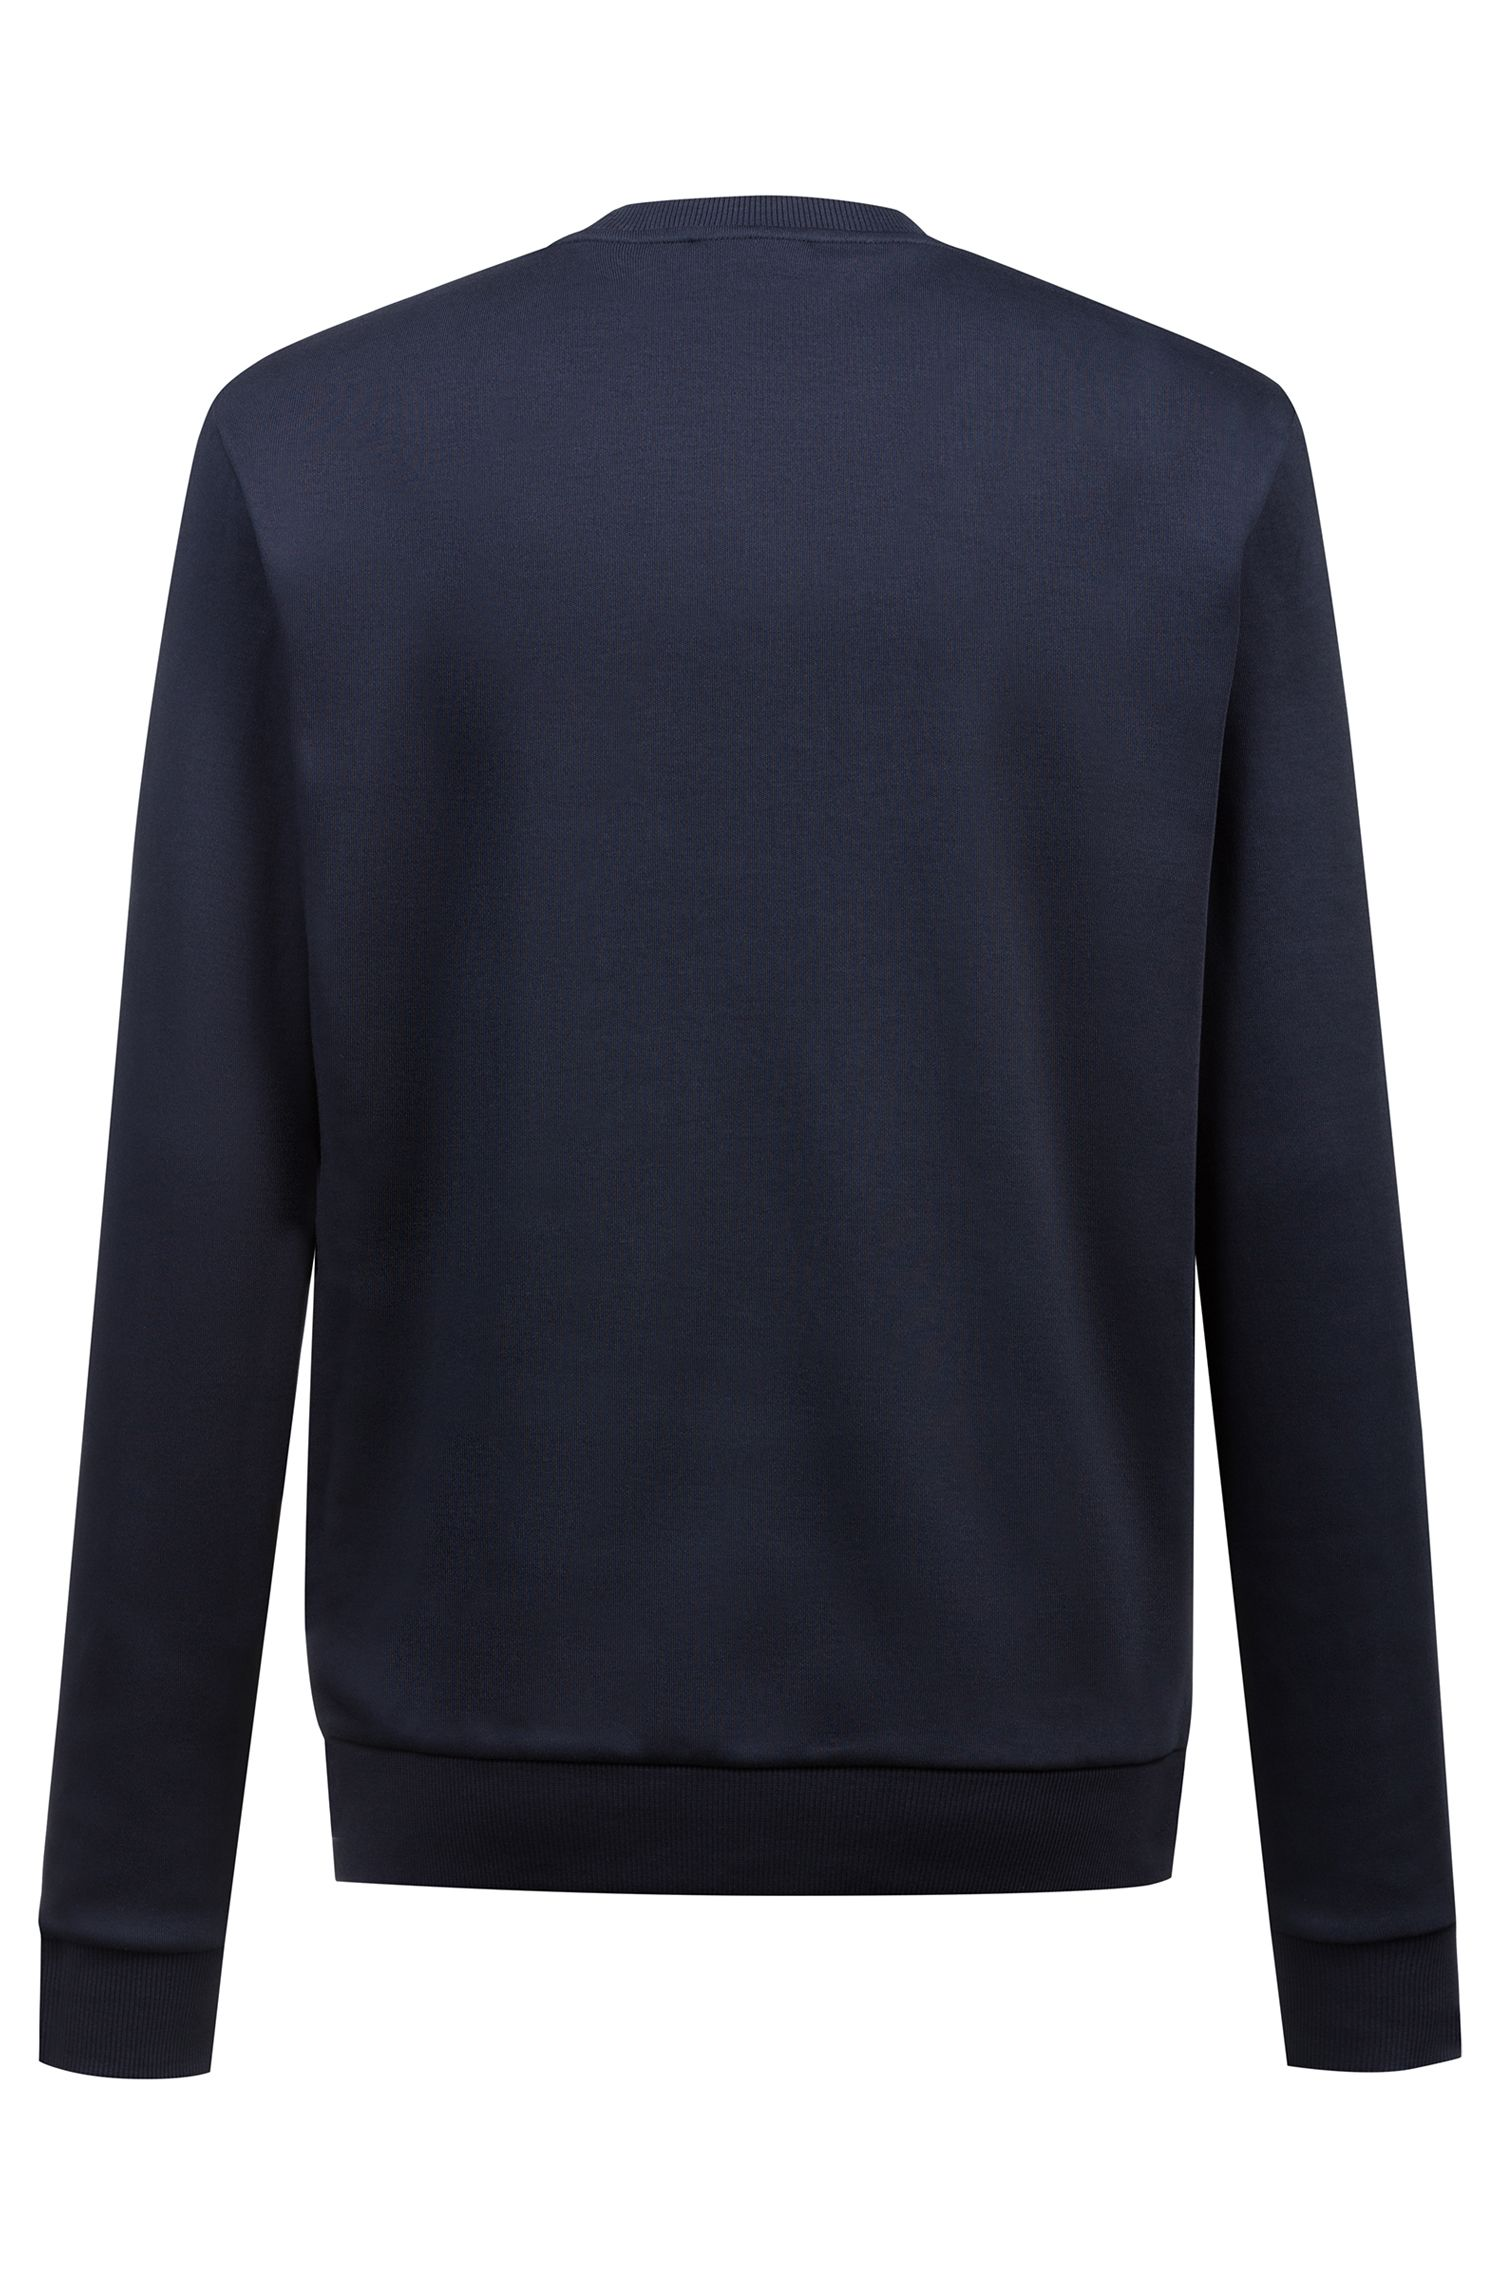 Hugo Boss - Interlock-cotton sweatshirt with partially concealed logo - 4